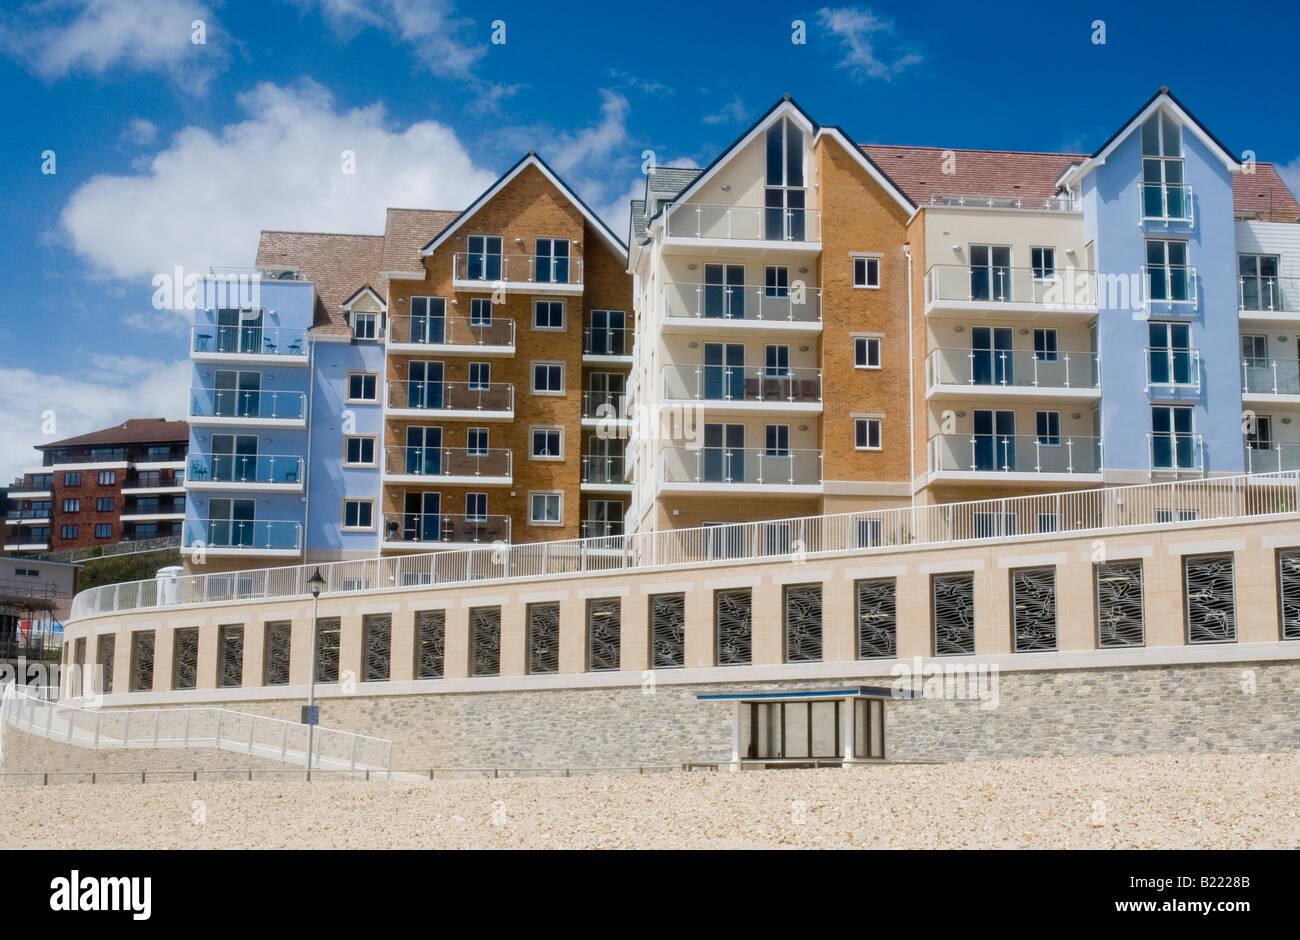 New Housing Development : The new barratt homes development of seafront apartments